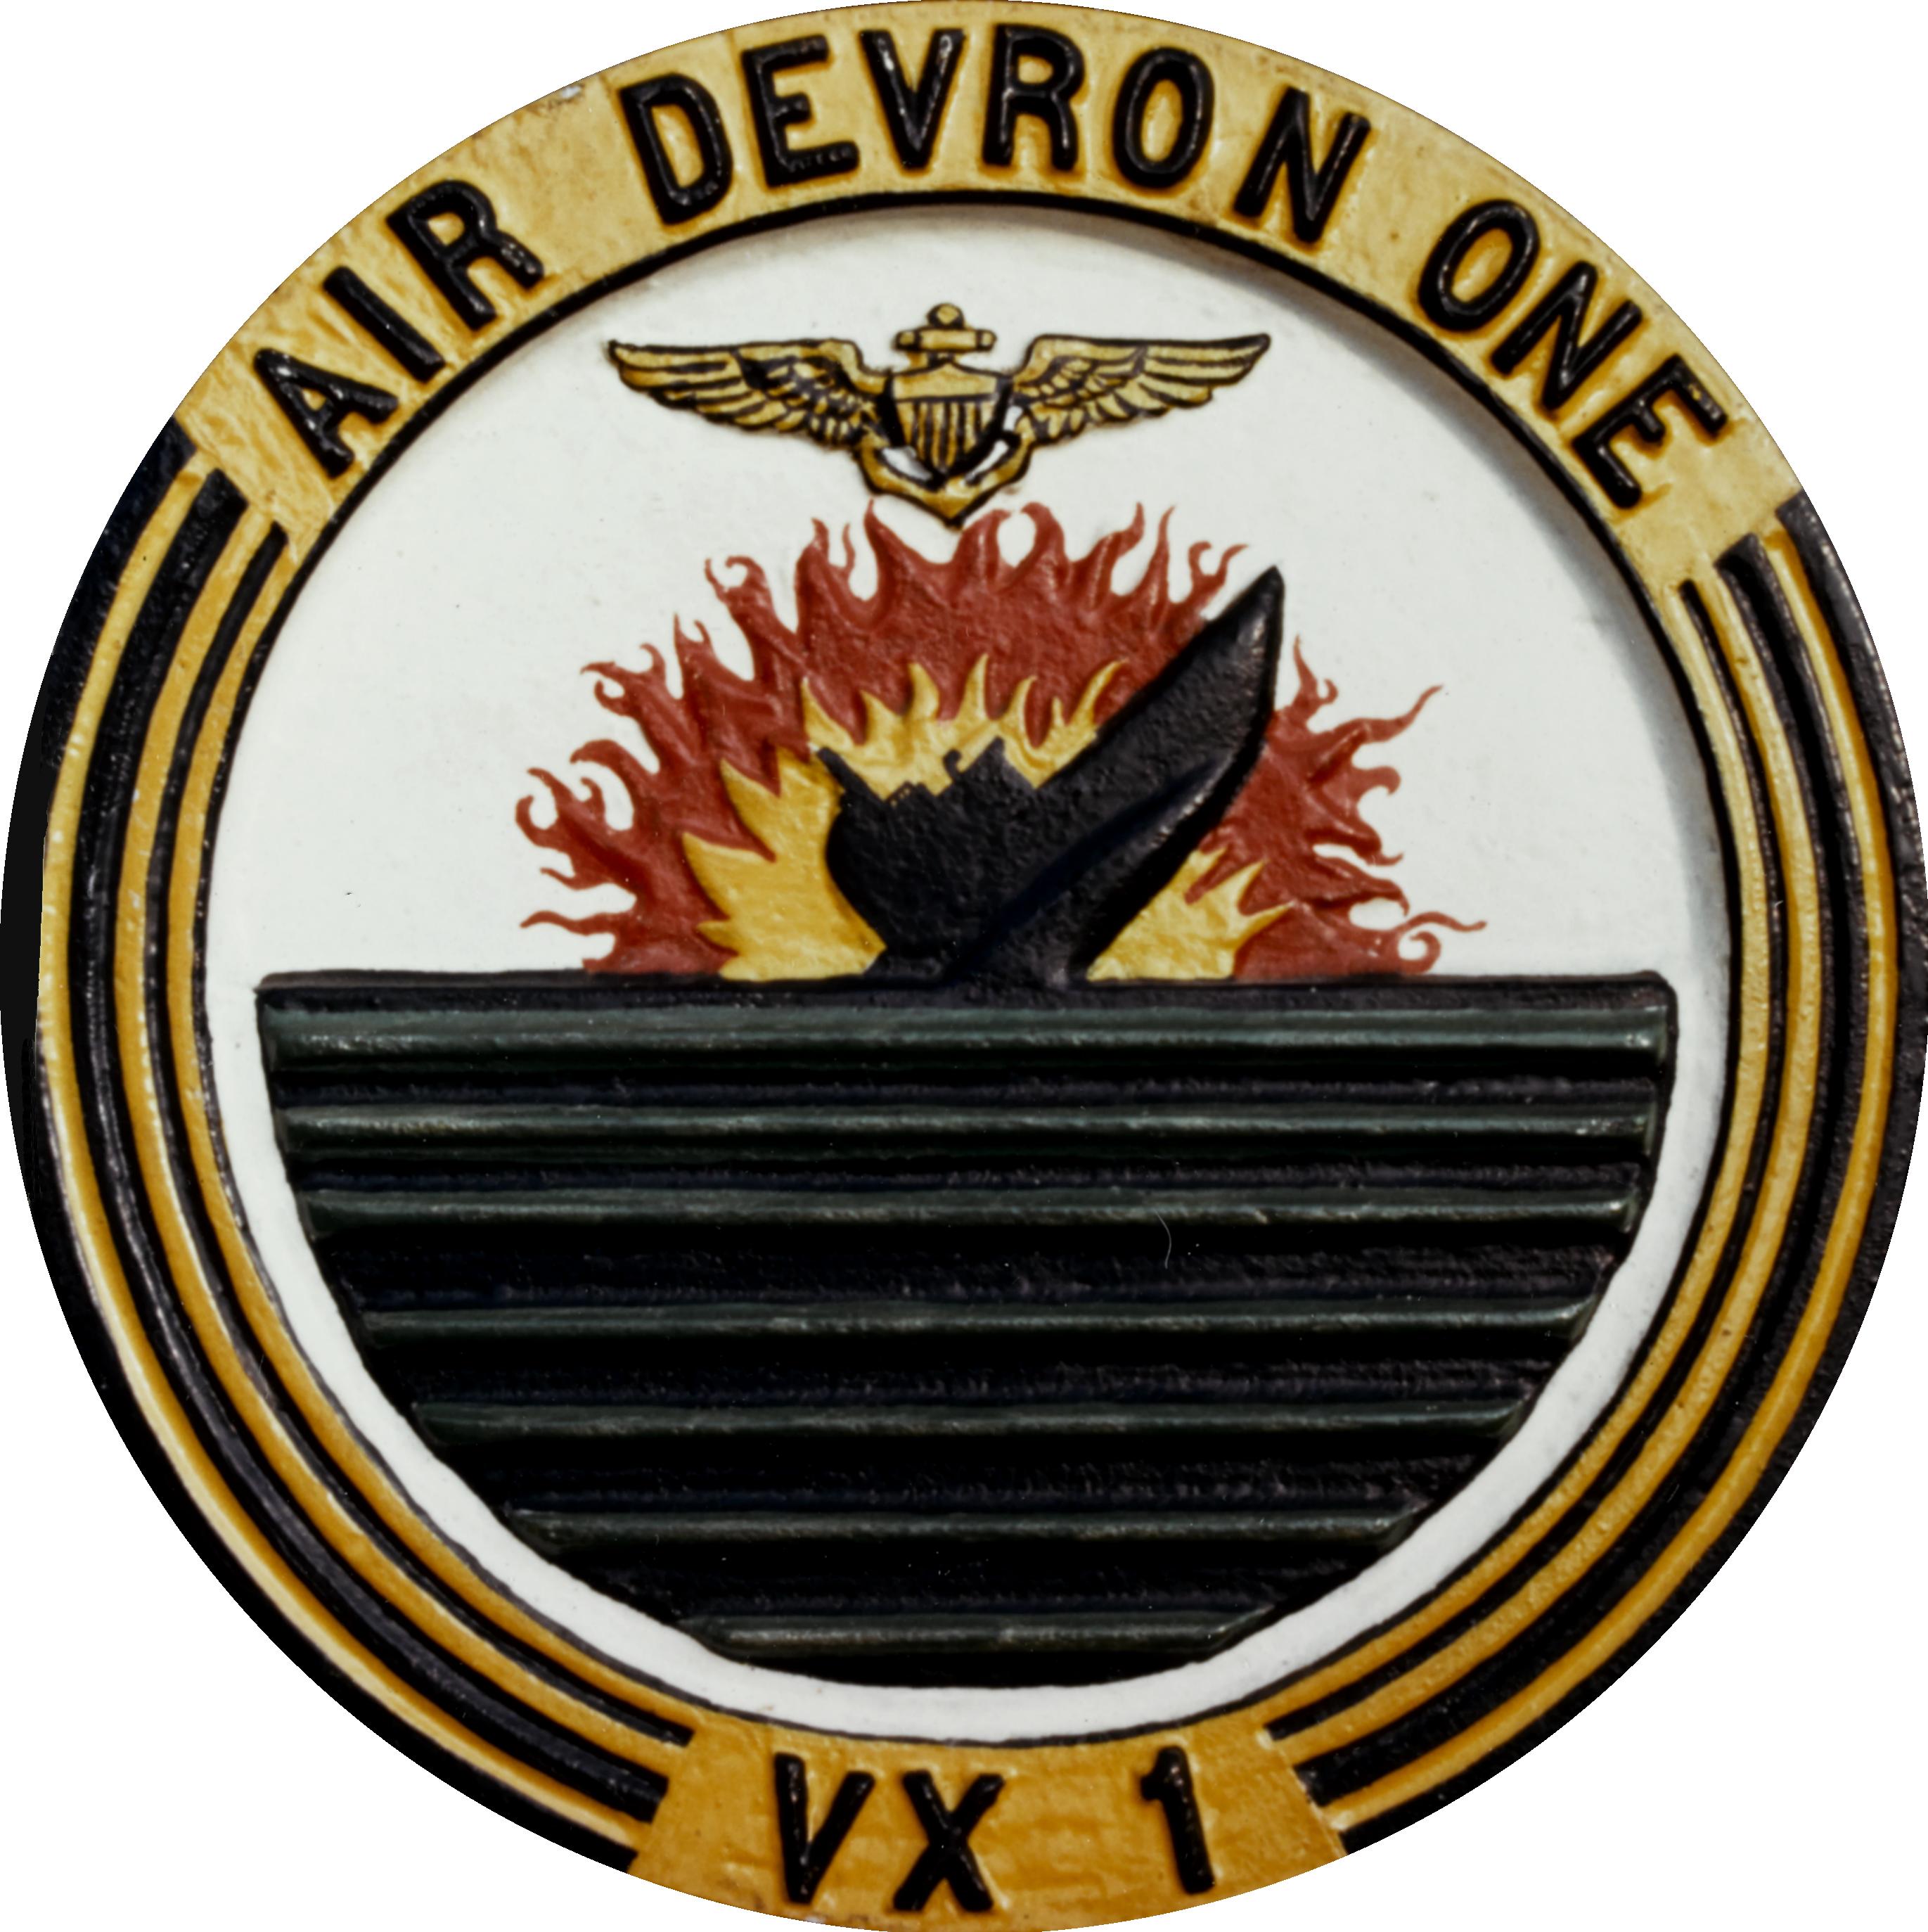 Fileair development squadron 1 us navy insignia 1943 nh 101852 fileair development squadron 1 us navy insignia 1943 nh 101852 biocorpaavc